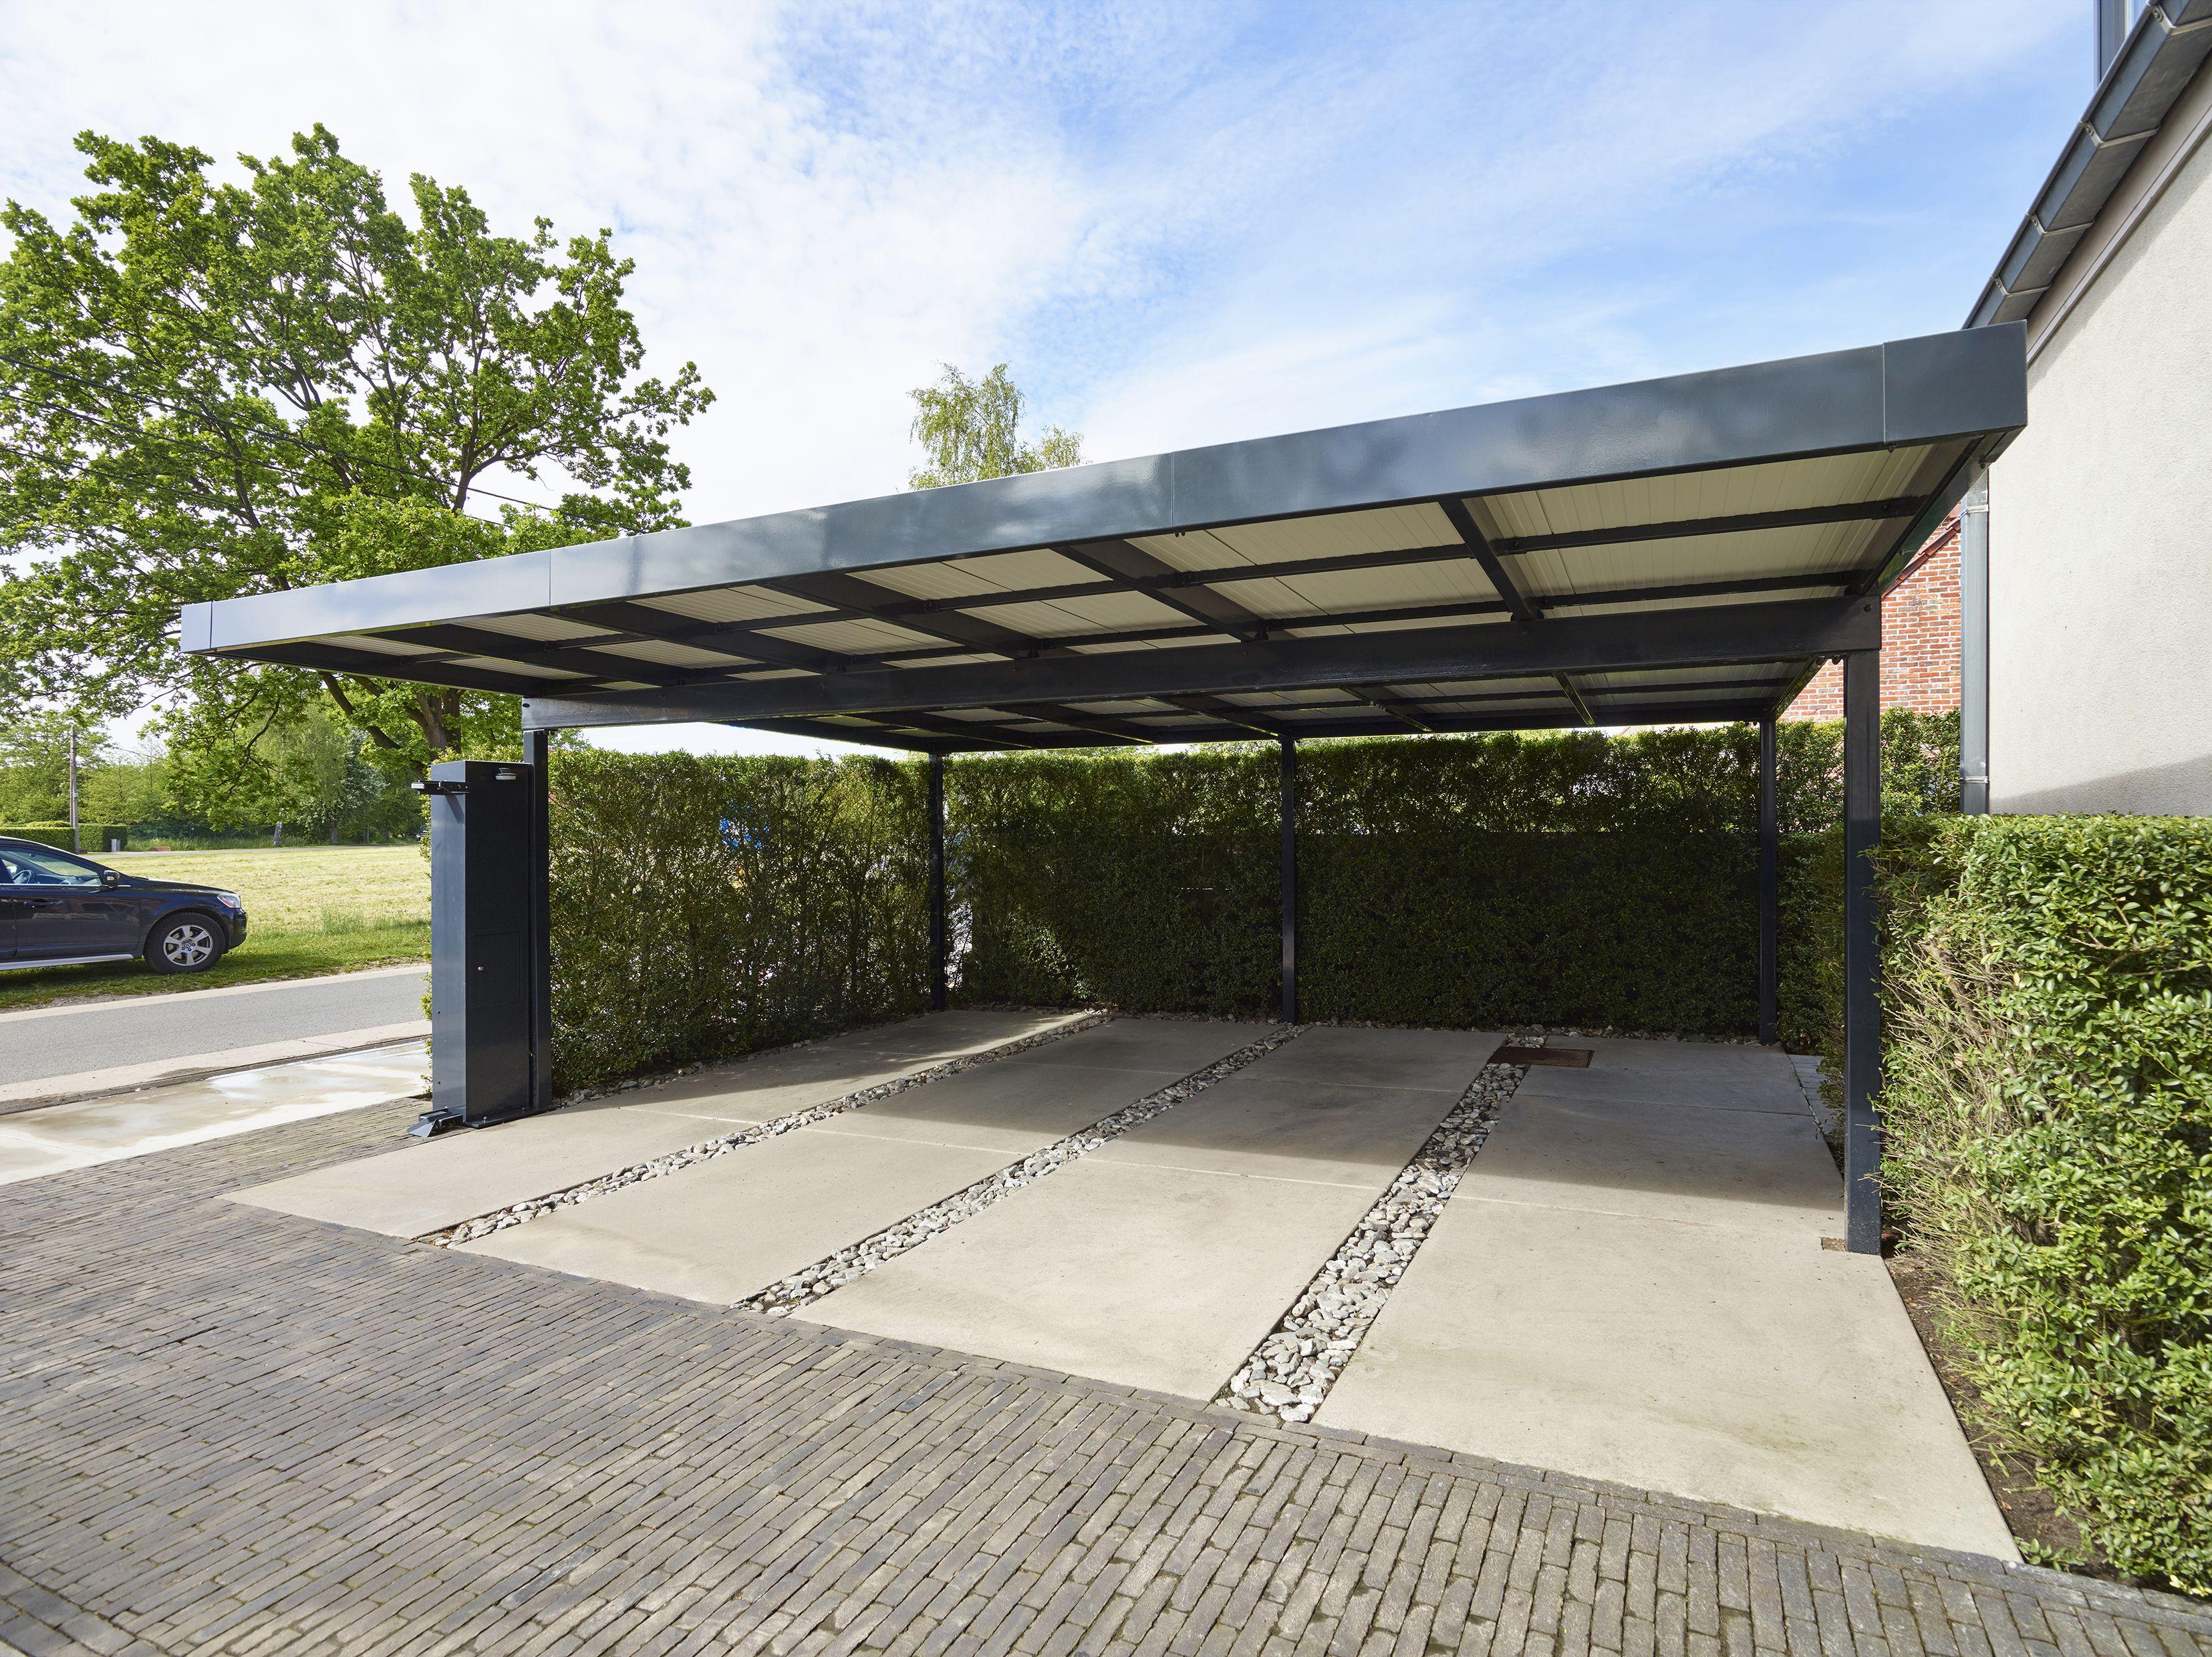 Steeldeck Carport With Flat Roof Carport Designs Modern Carport Car Porch Design